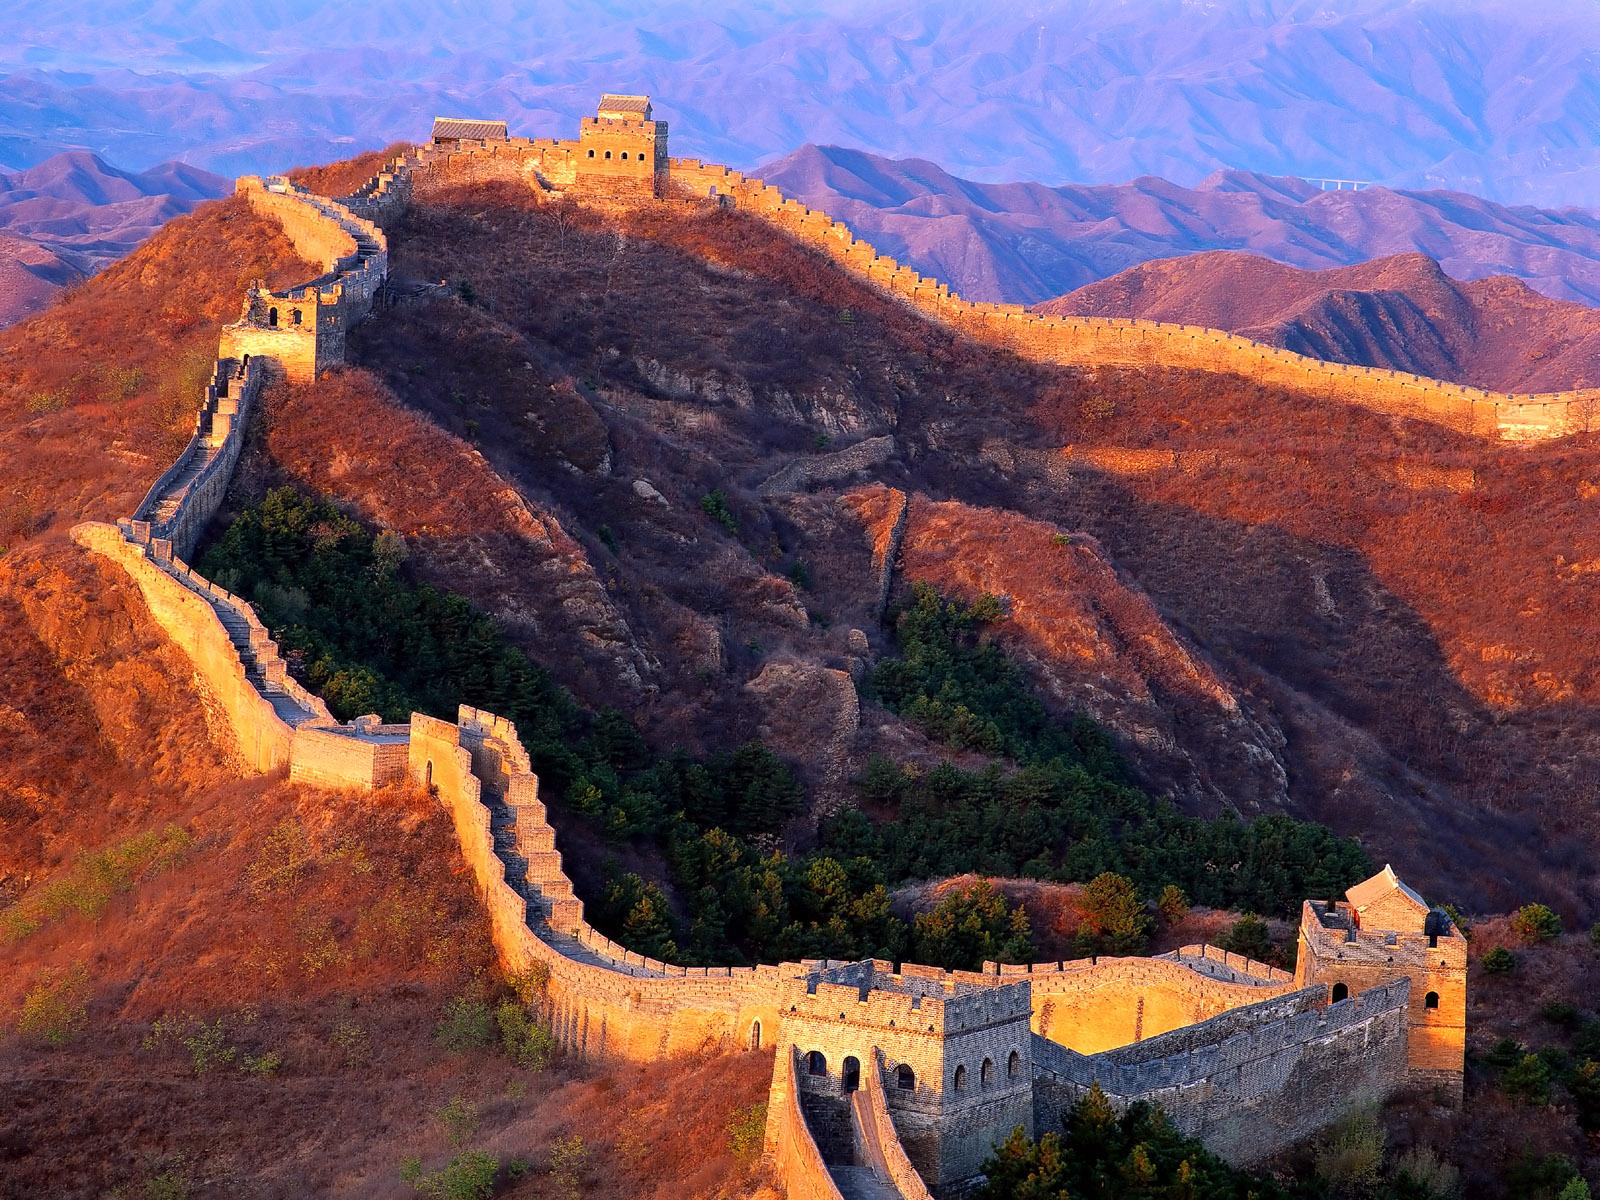 Black Wallpaper Great Wall of China 1600x1200